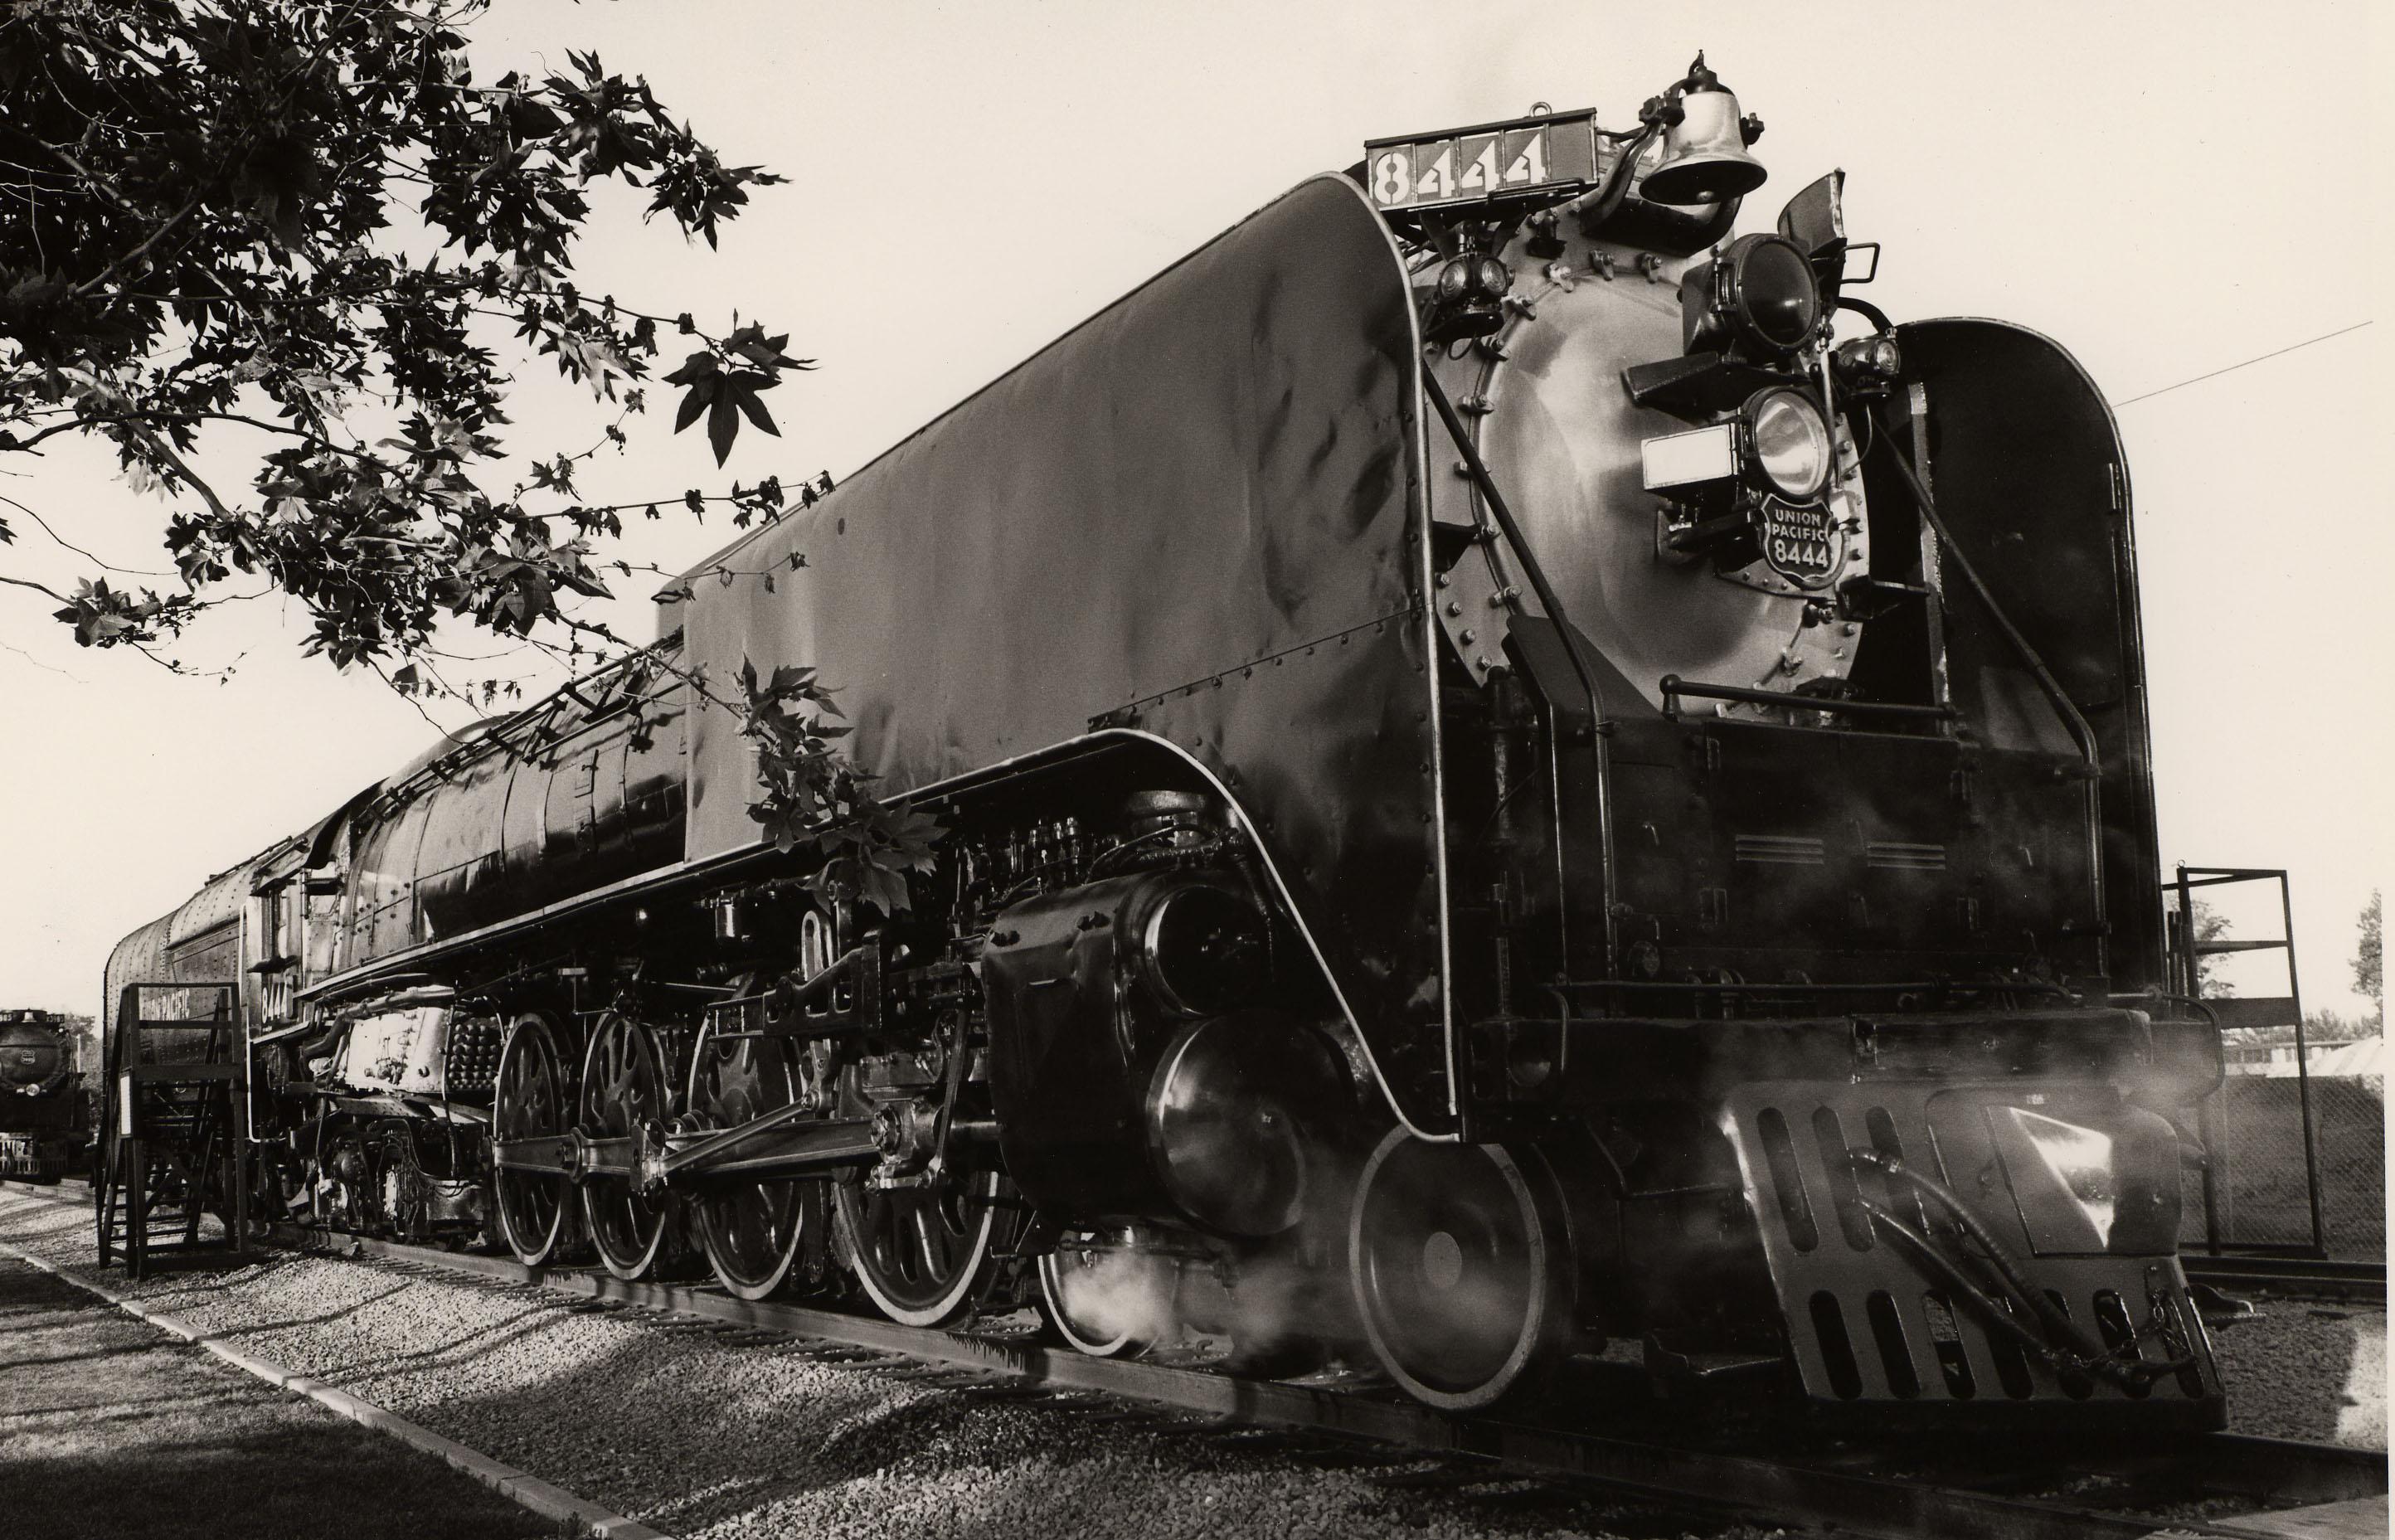 844-Missouri-State-Archive-1965